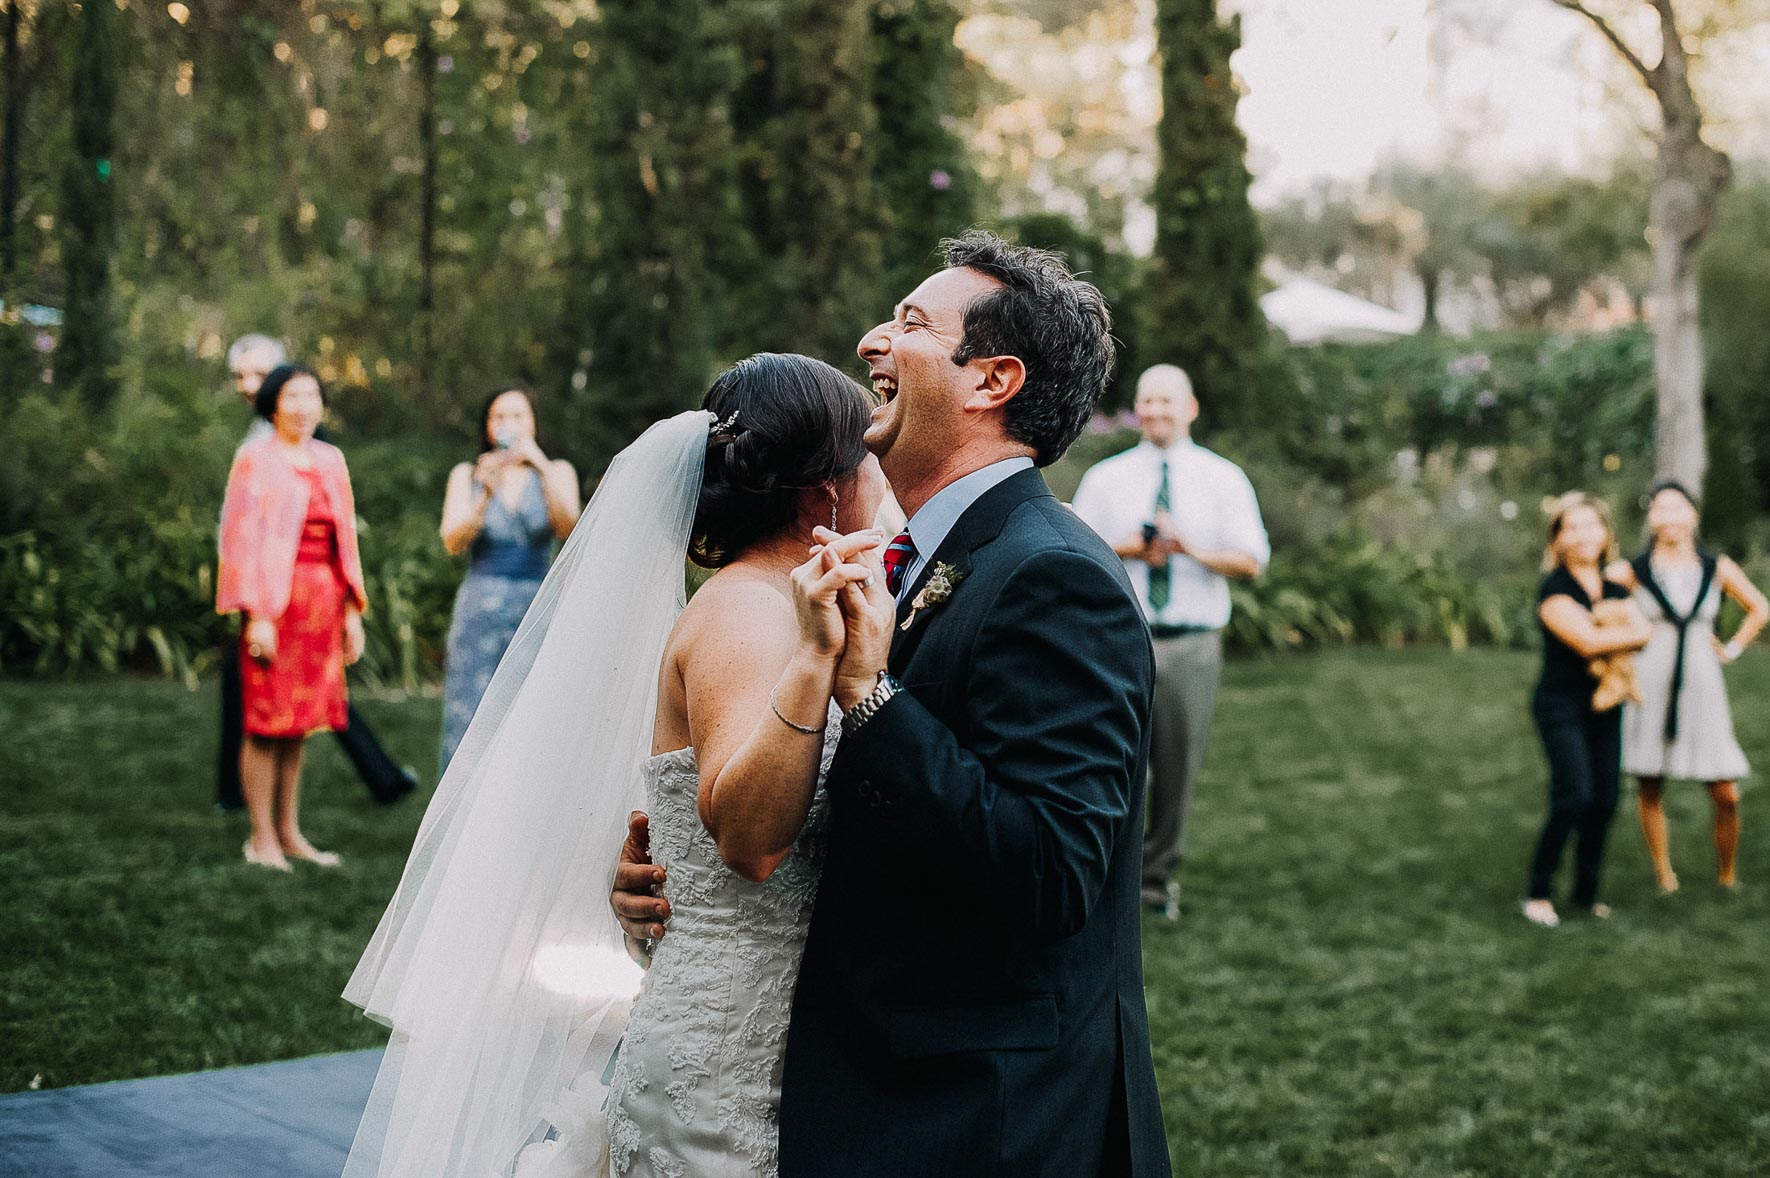 Caroline + Frank Wedding - 1266 copy 2